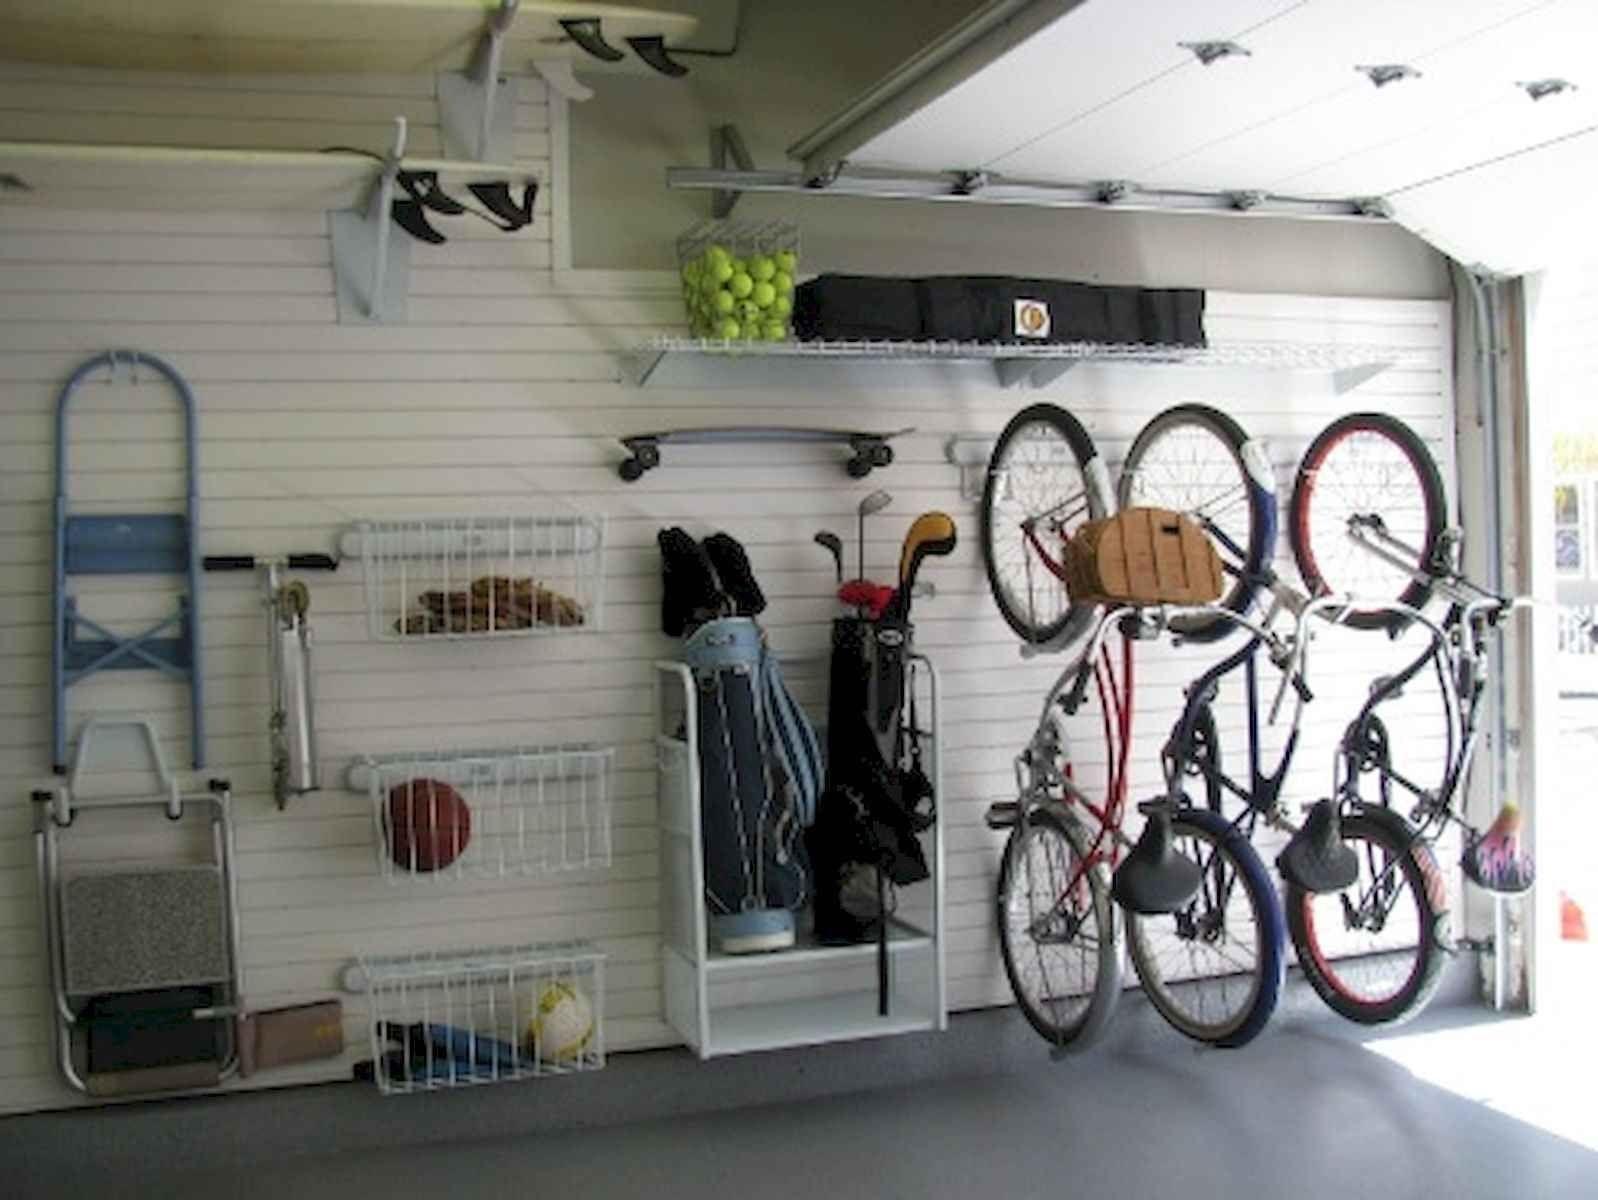 30 amazing garage organization ideas and decorations on inspiring diy garage storage design ideas on a budget to maximize your garage id=18999